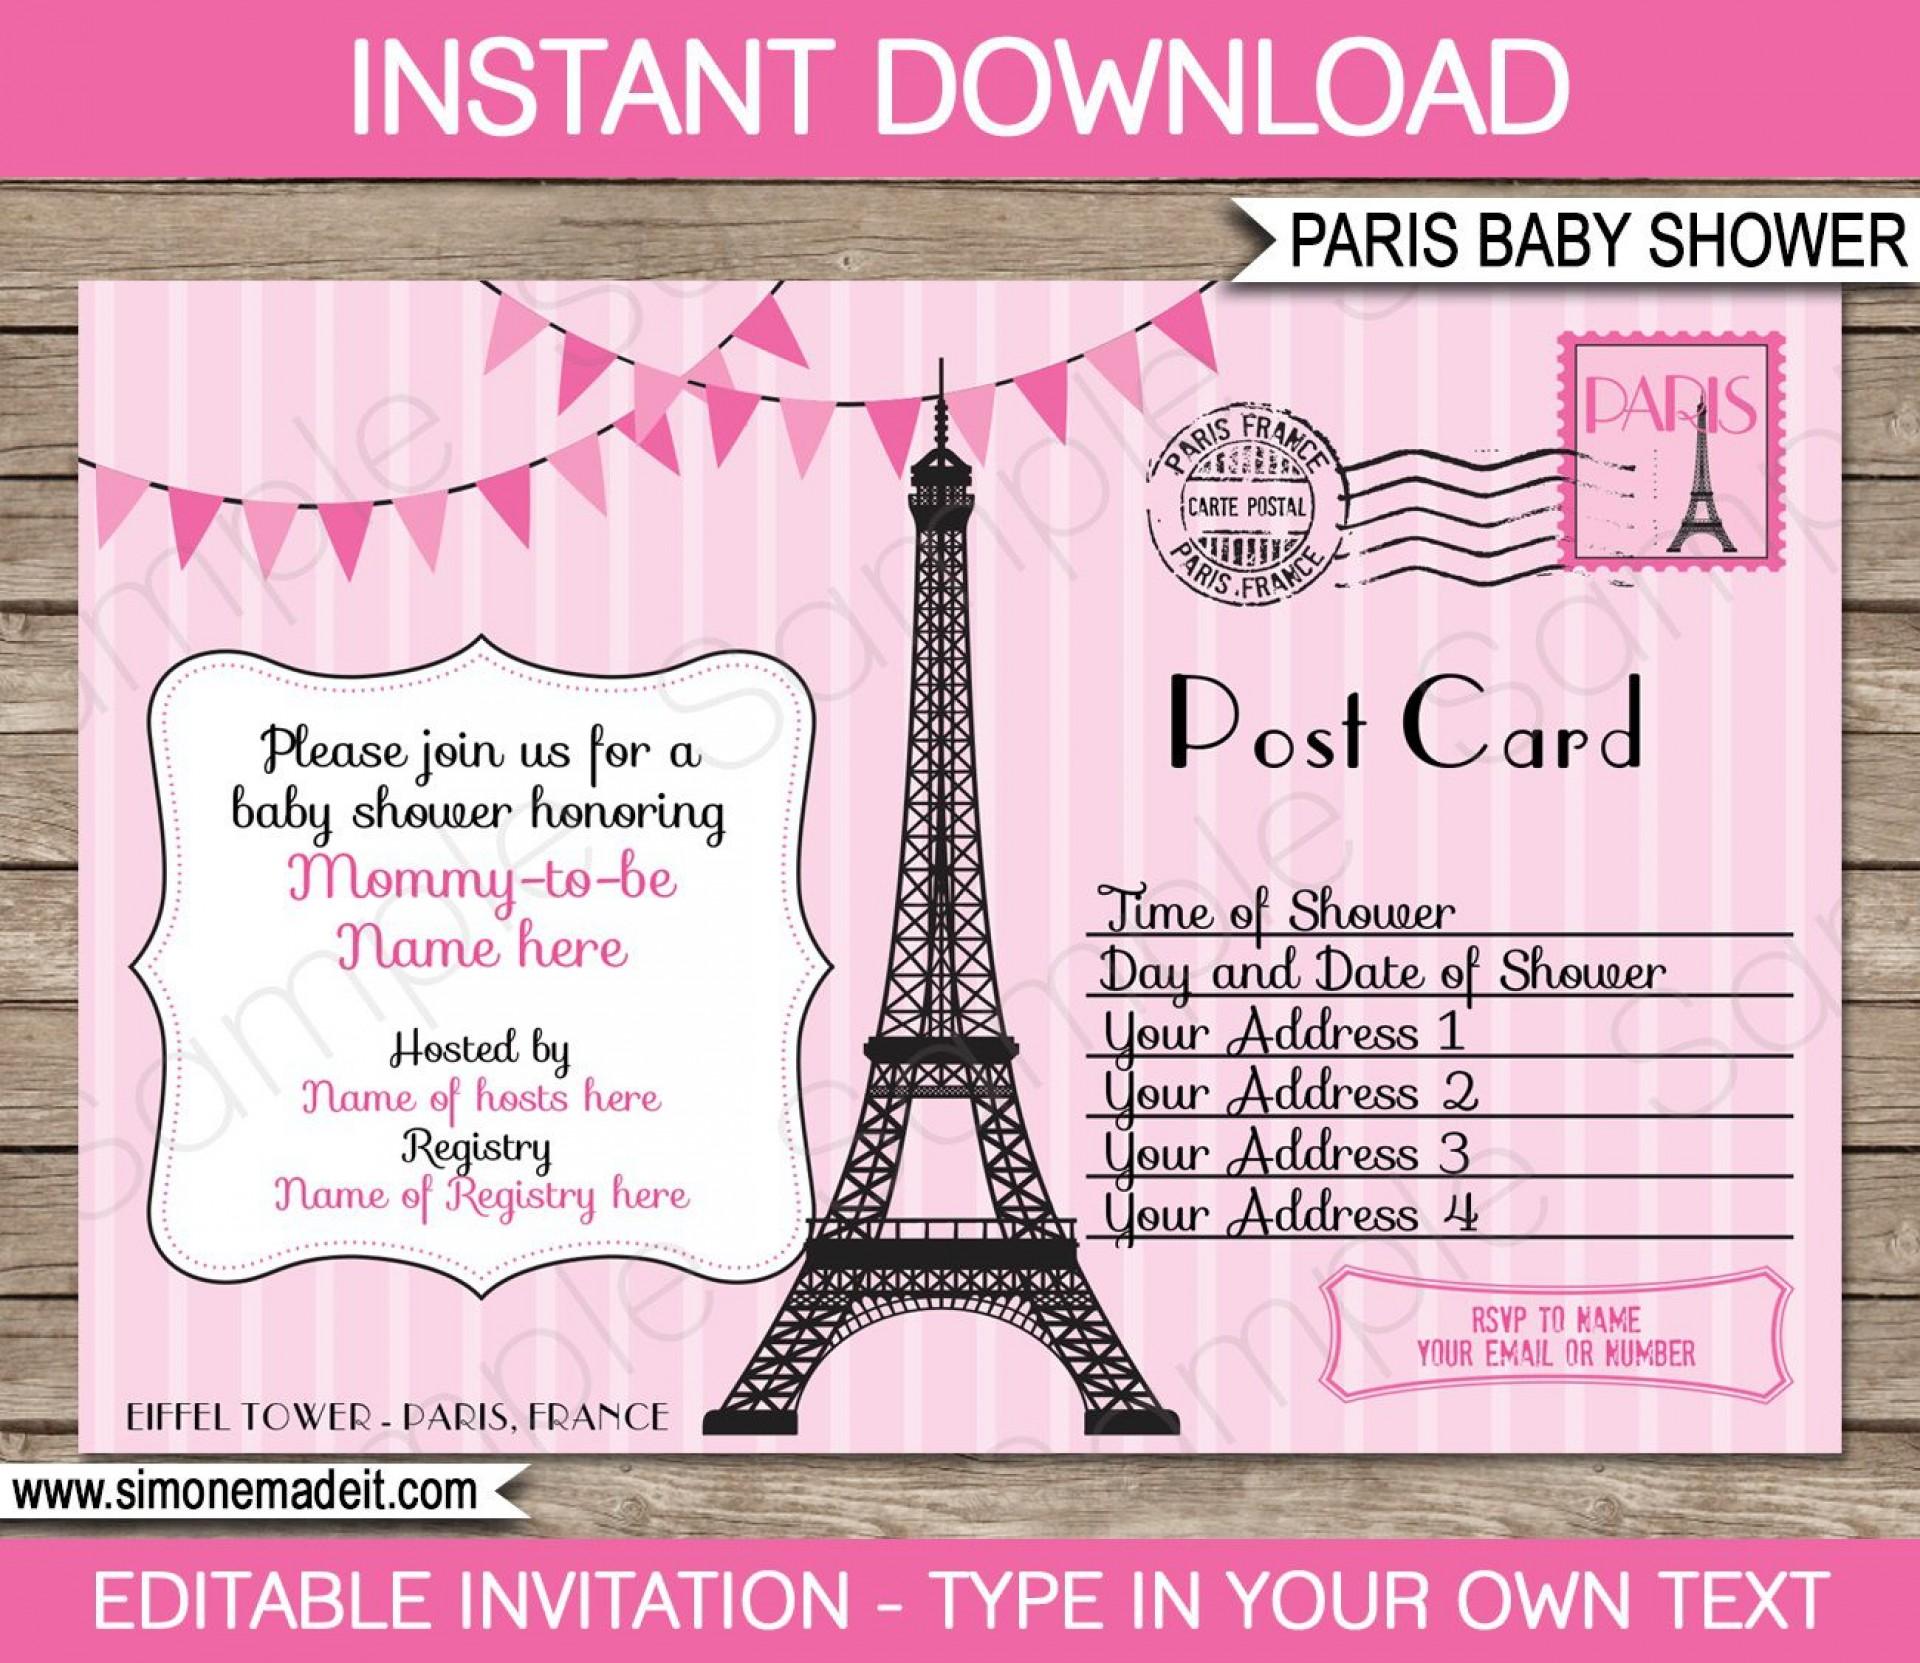 008 Stupendou Baby Shower Invitation Template Editable High Definition  Free Surprise In Gujarati Twin1920